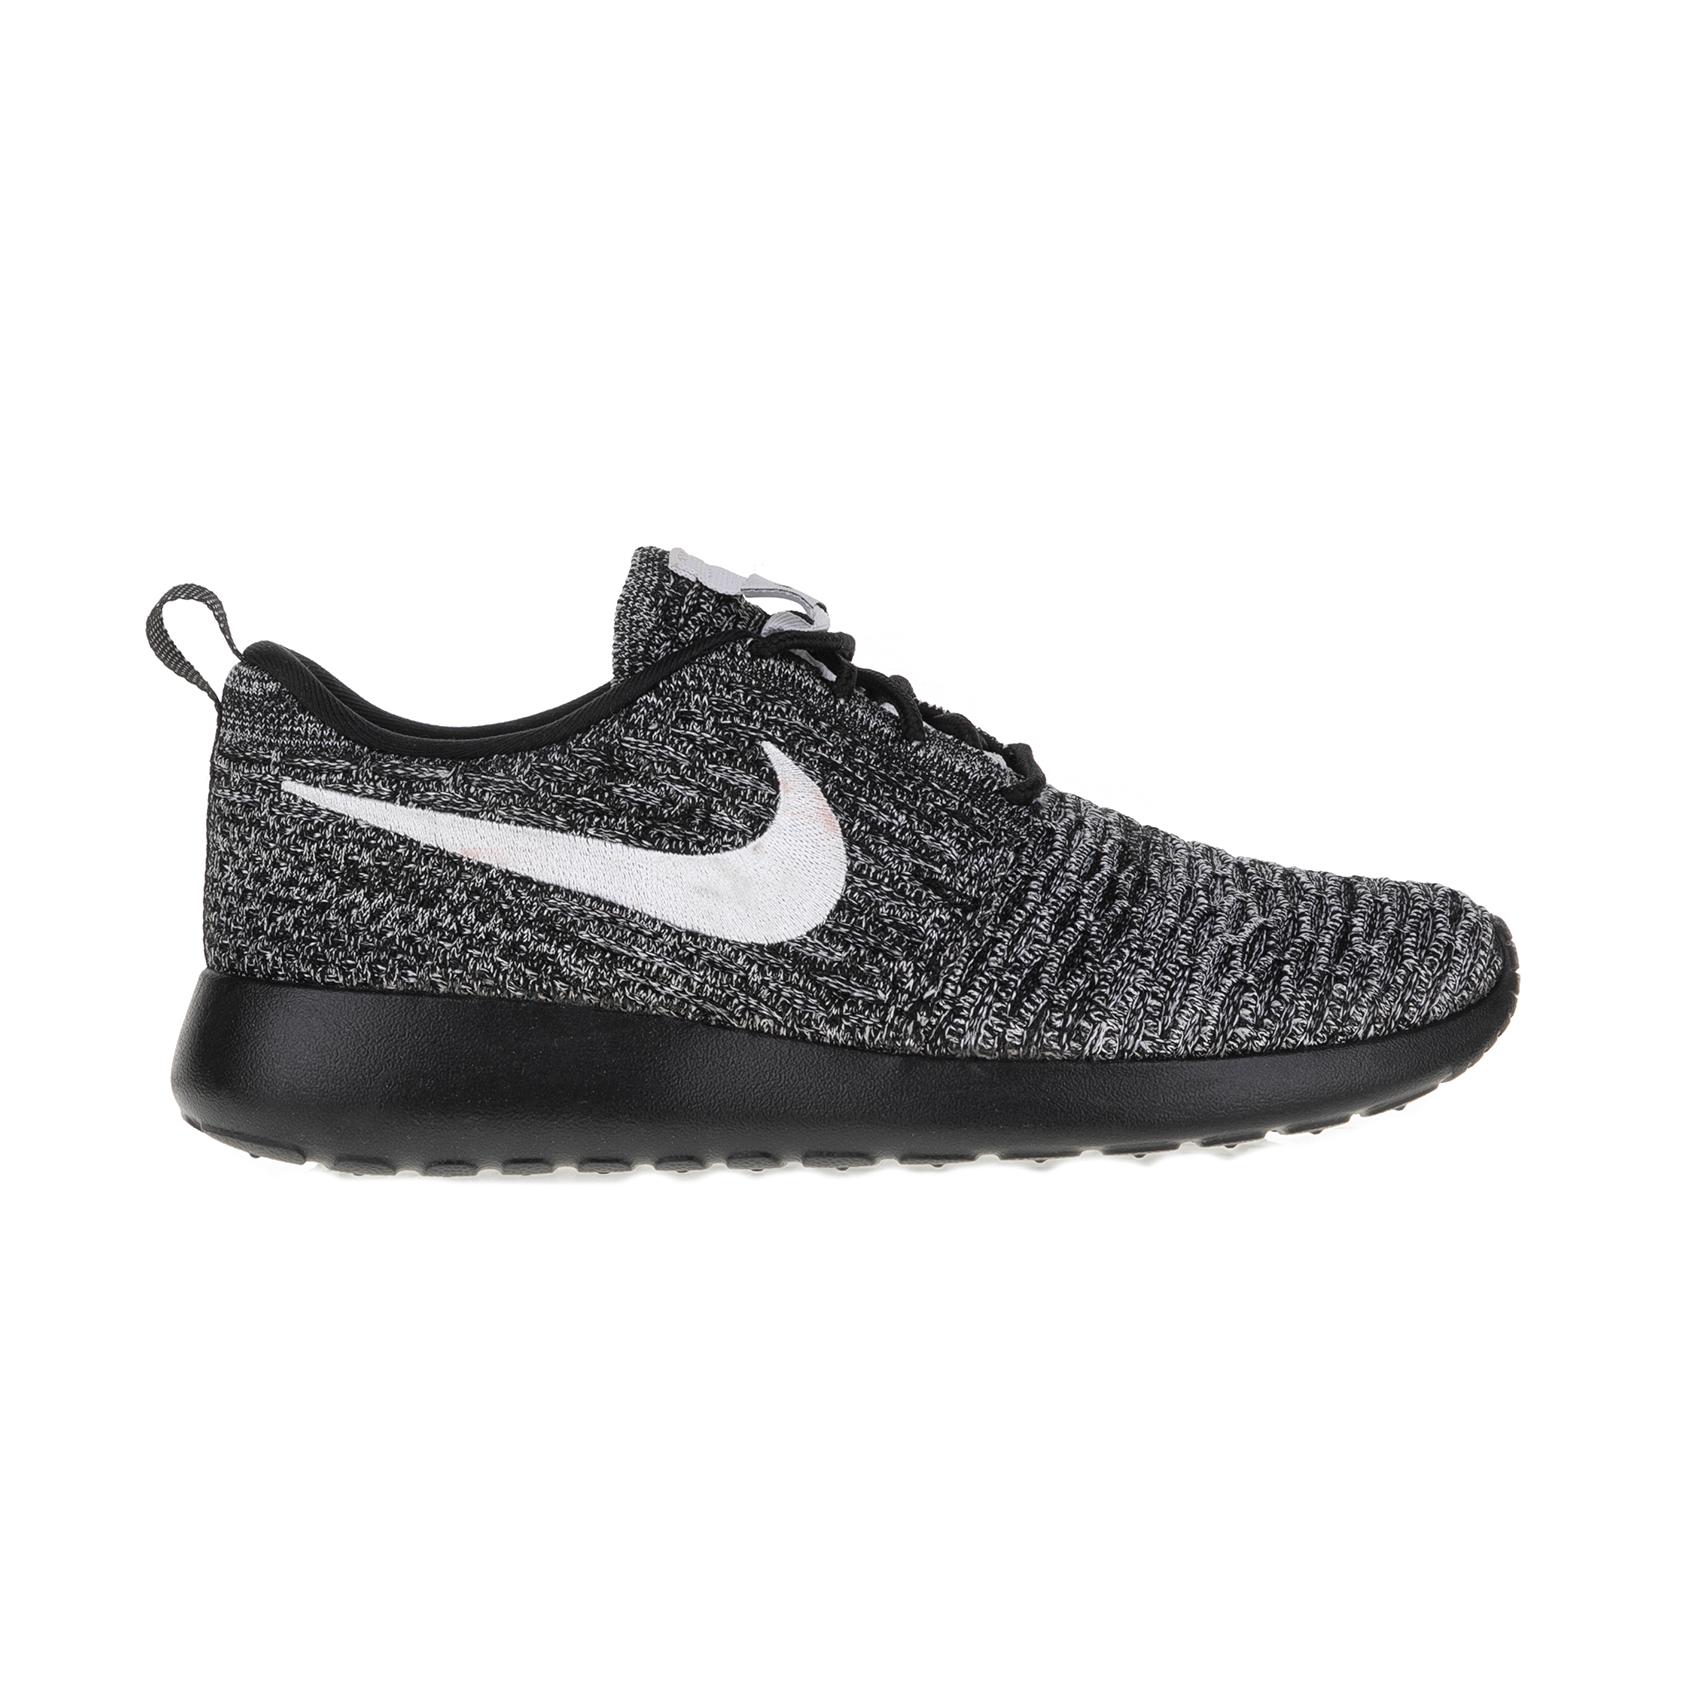 f67f61383748 NIKE - Γυναικεία αθλητικά παπούτσια Nike ROSHE ONE FLYKNIT μαύρα ...